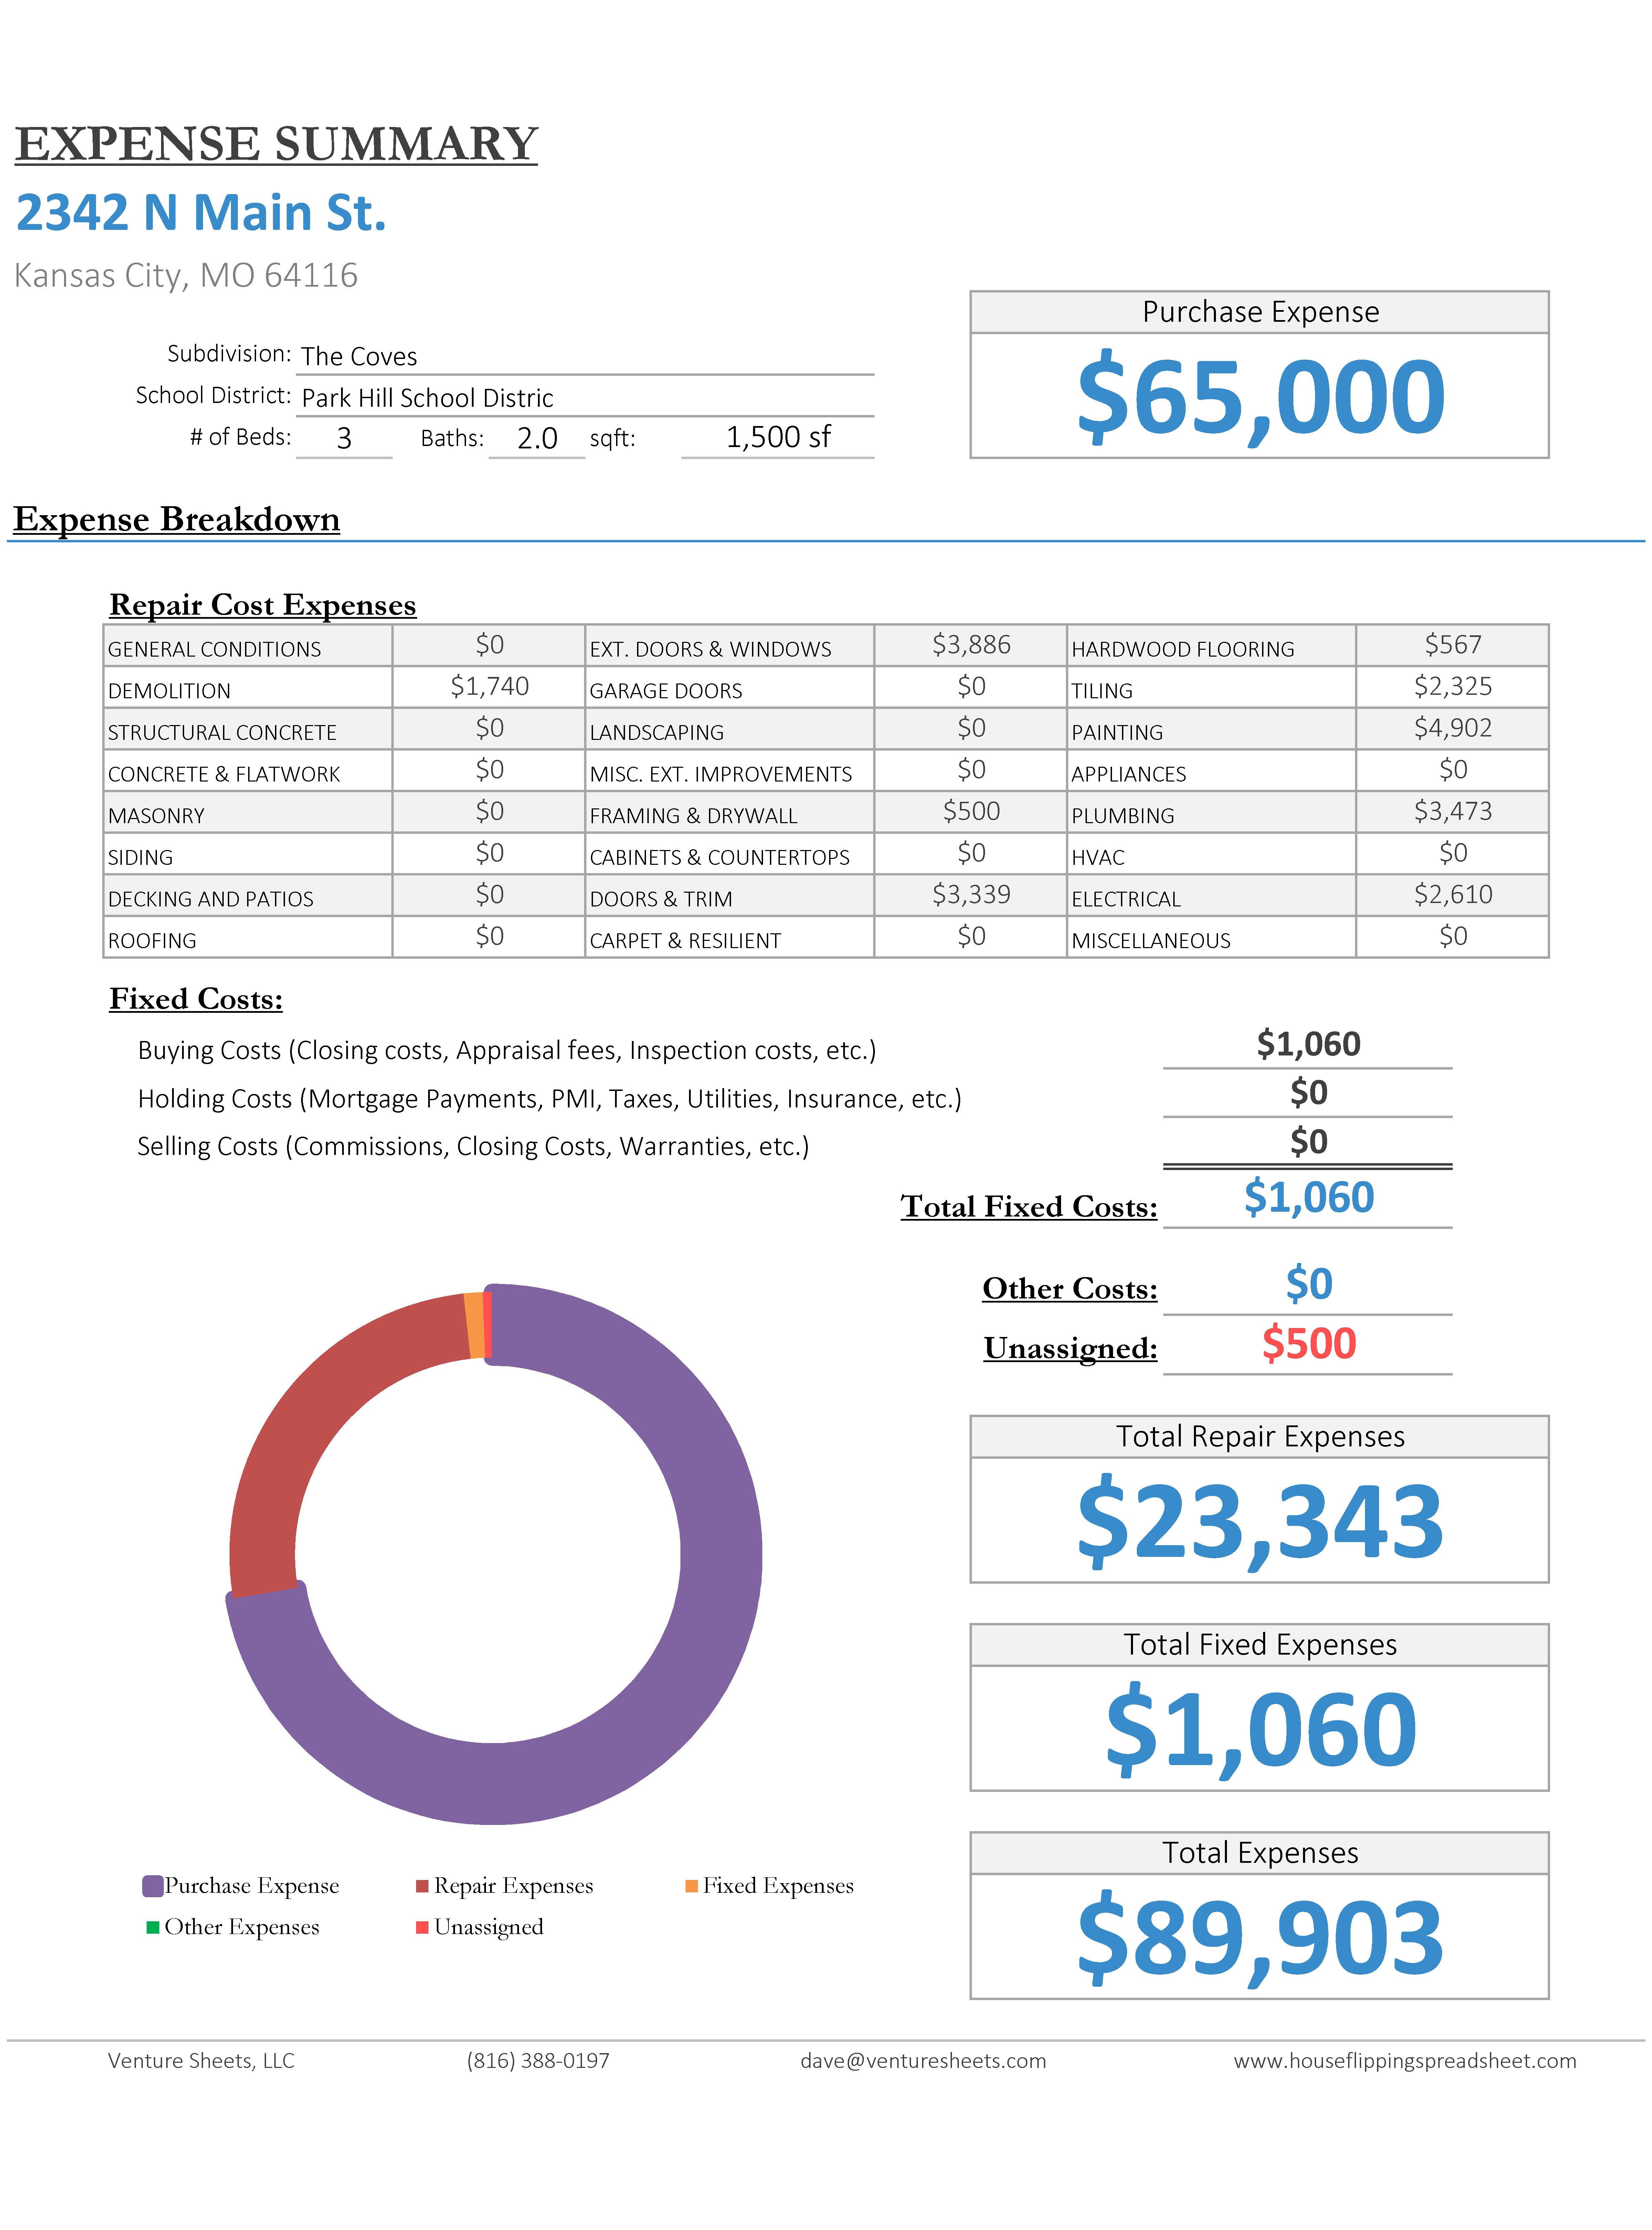 Deal Analyzer Spreadsheet Intended For House Flipping Spreadsheet  Rehabbing And House Flipping